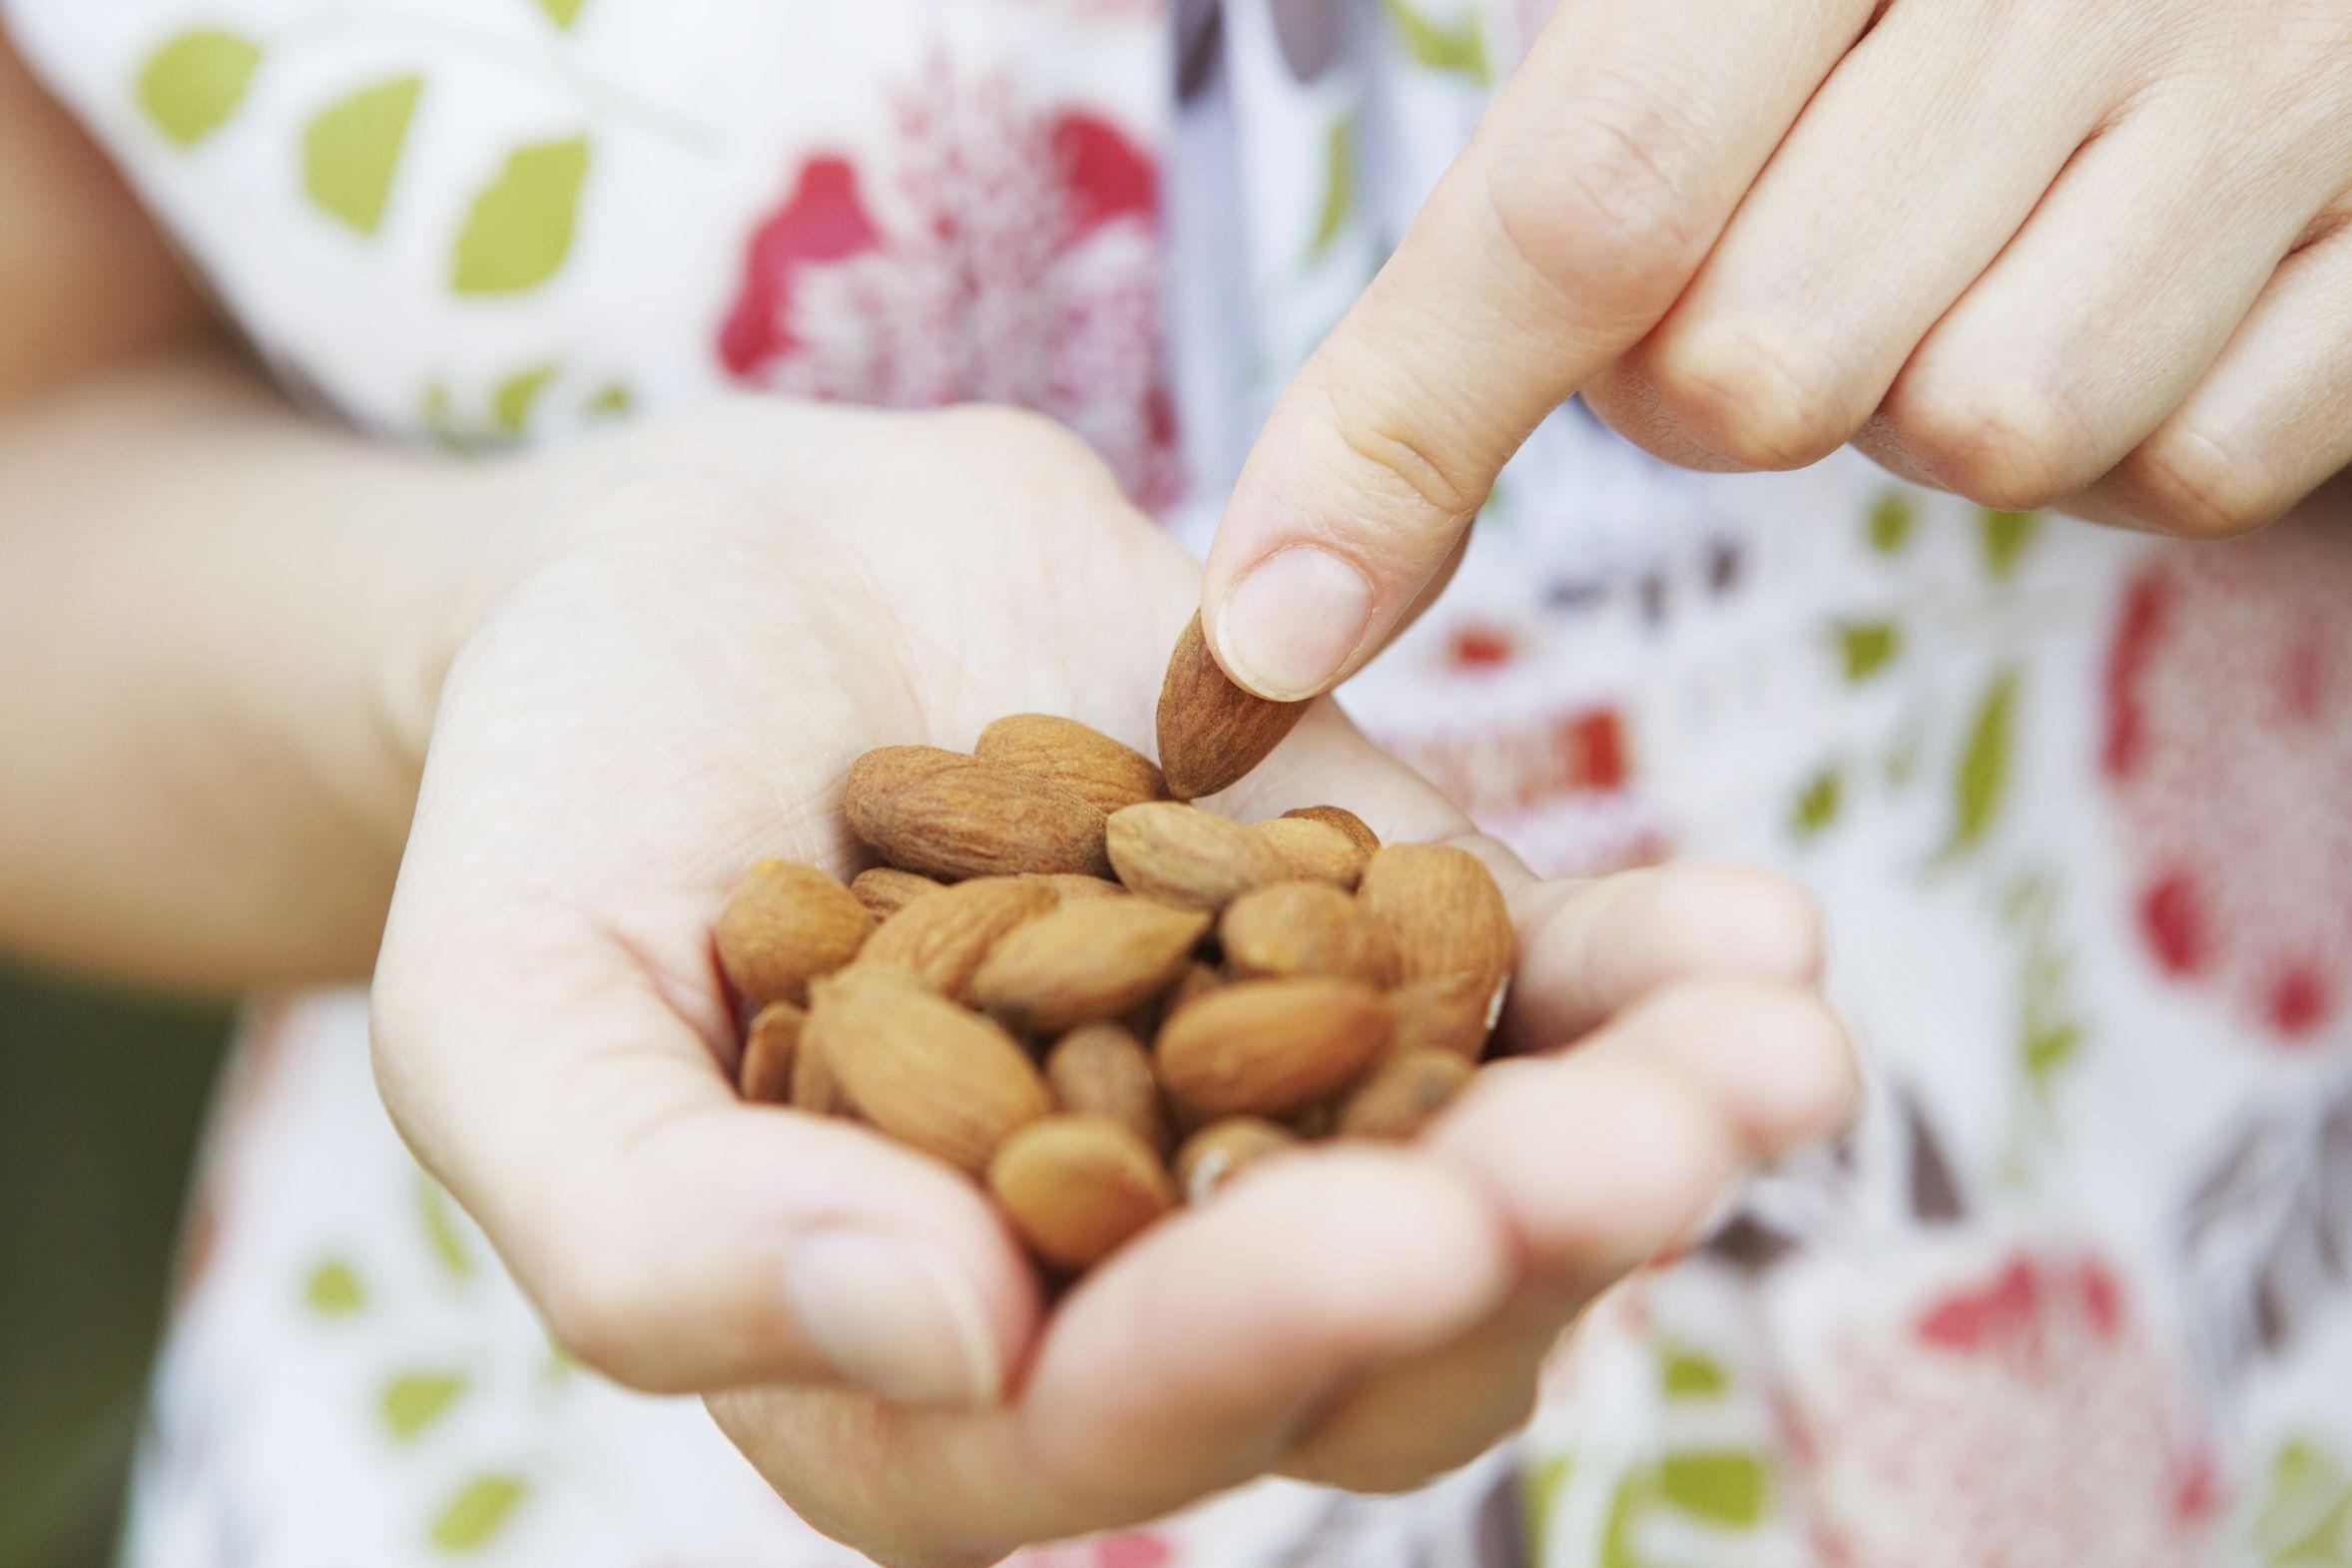 mandle - zdravie, účinky a benefity